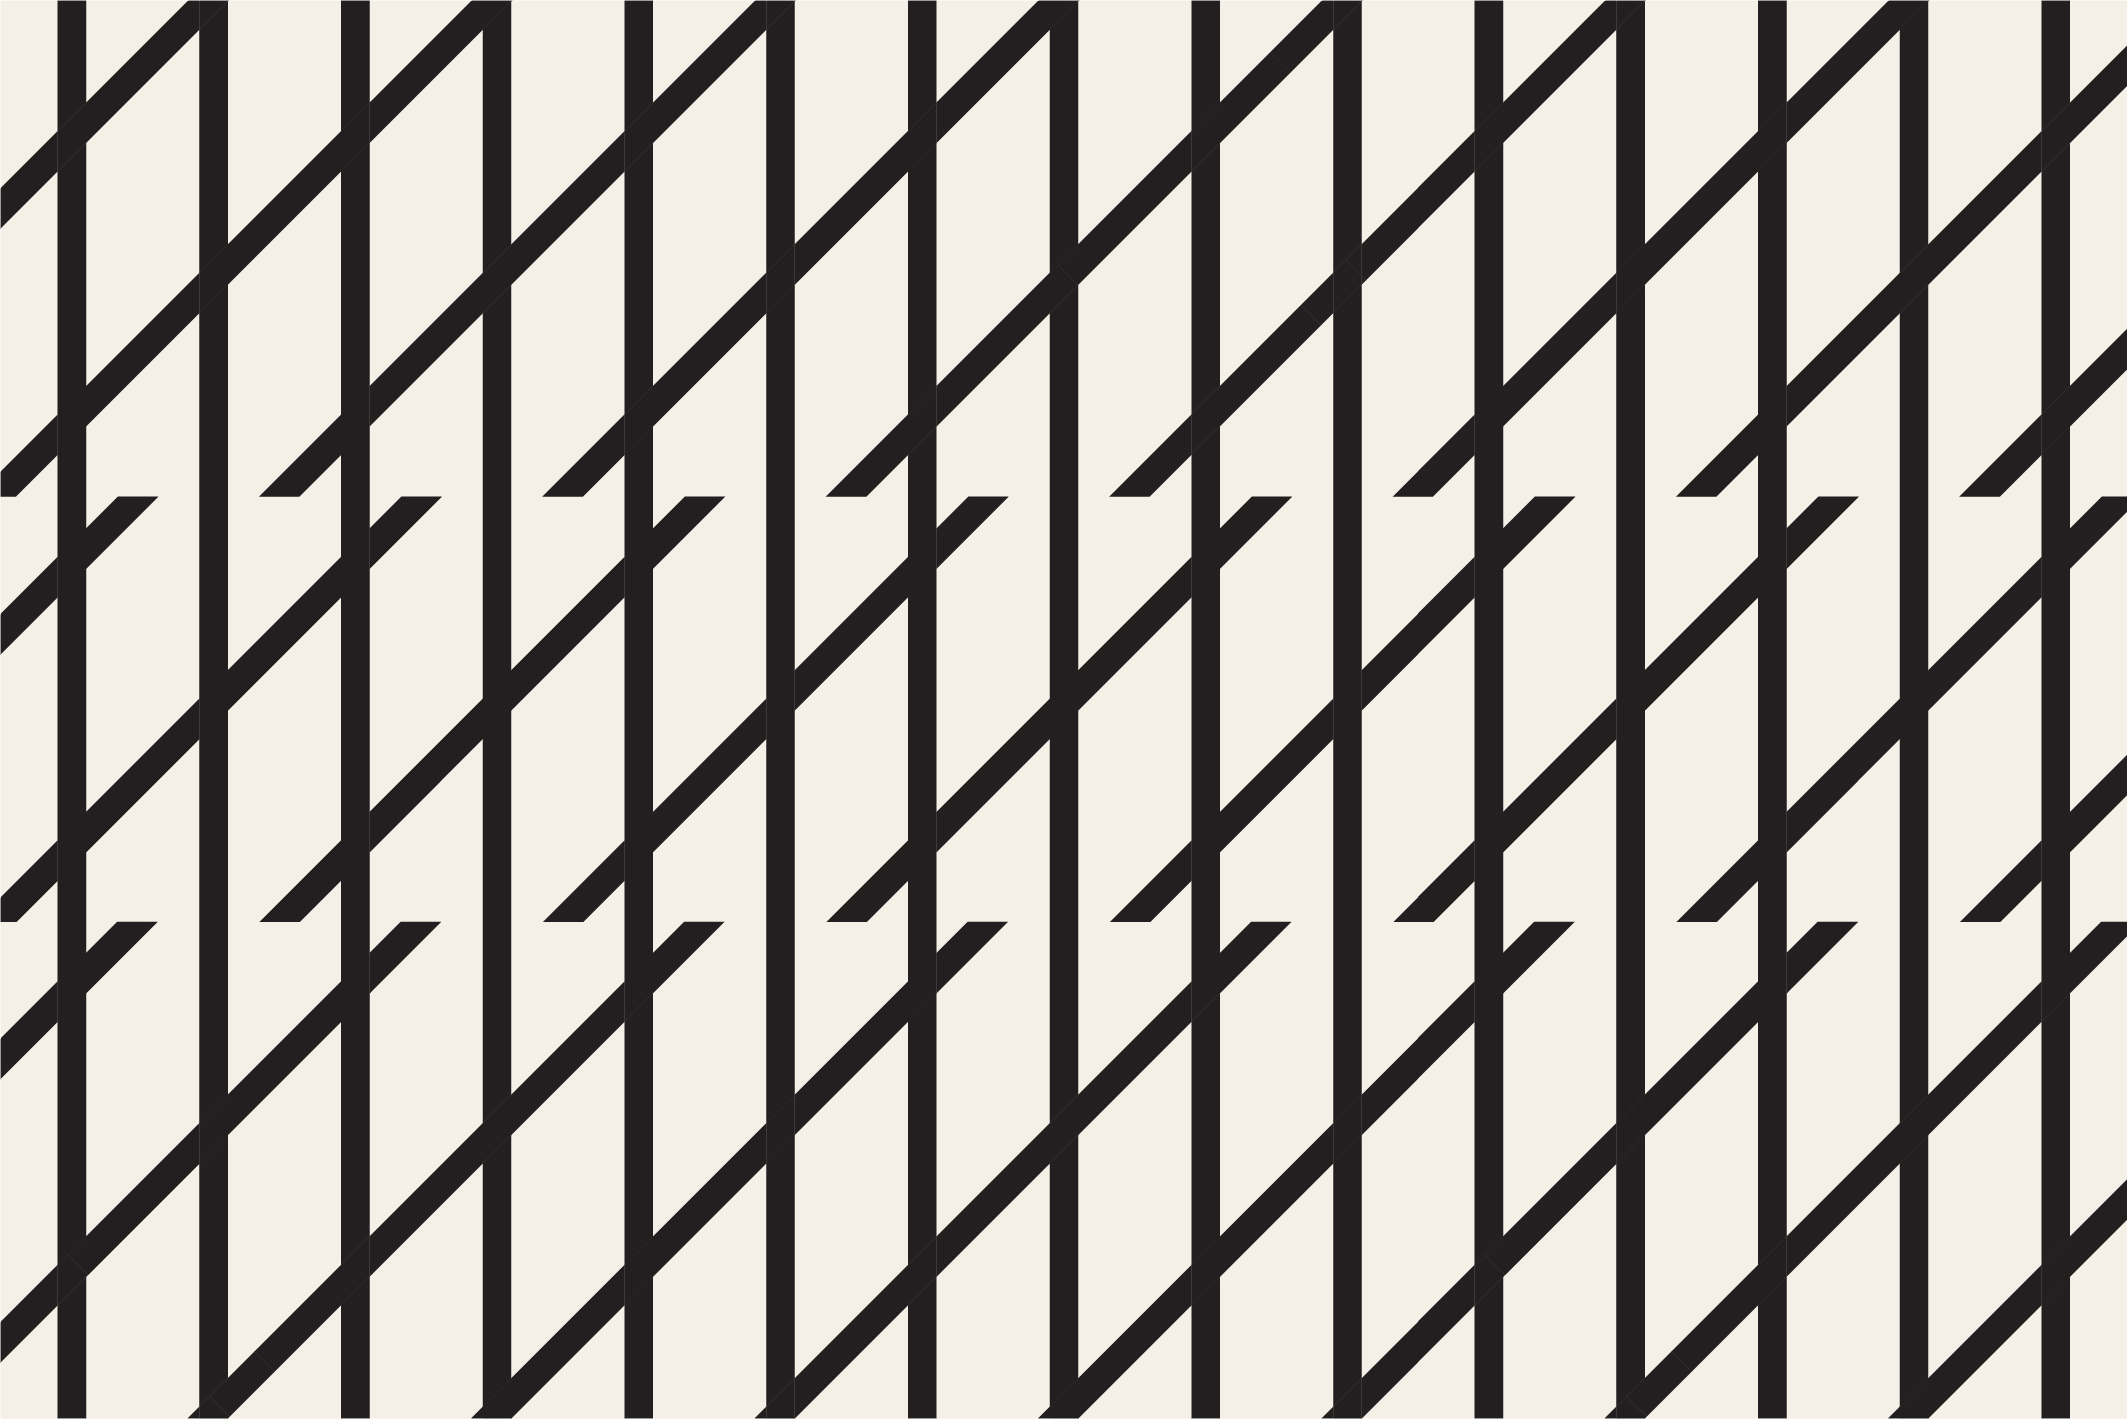 Geometric seamless patterns example image 12